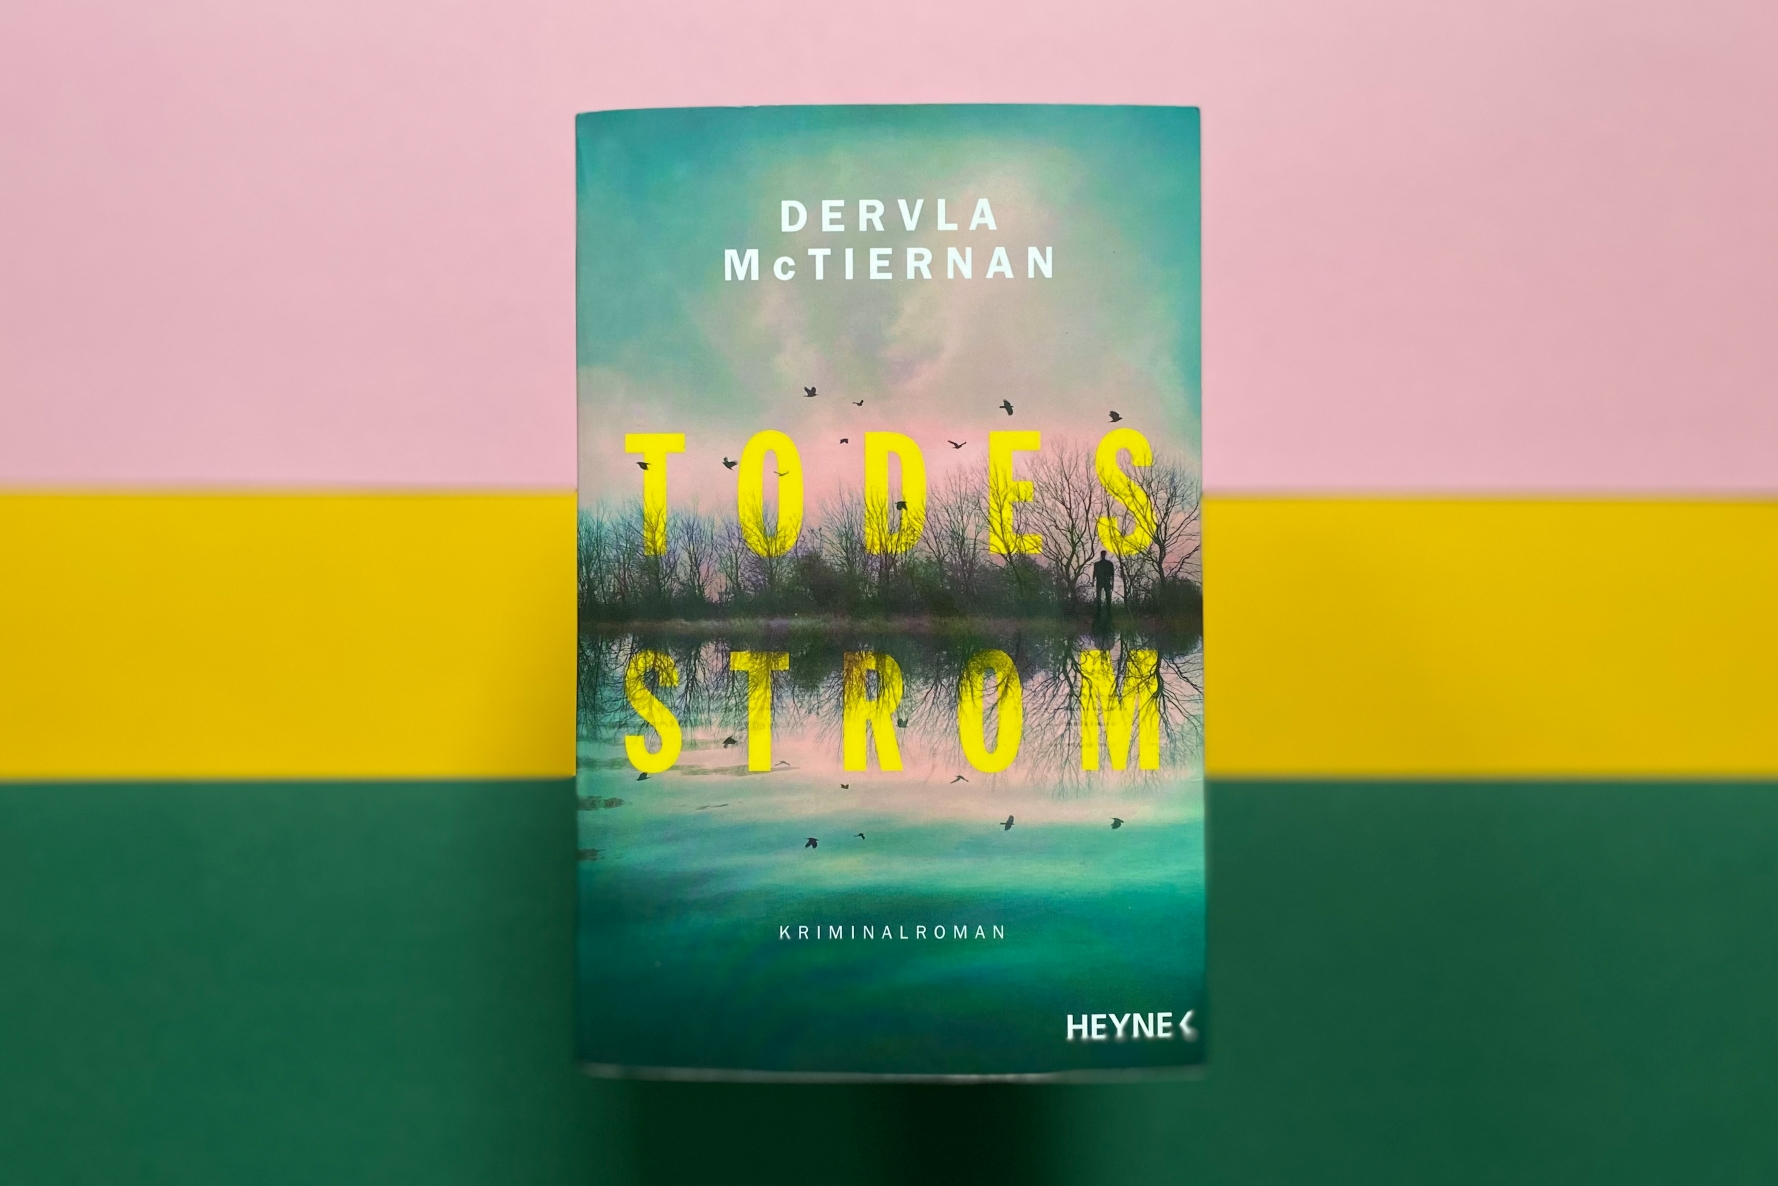 Dervla McTiernan Todesstrom Kriminalroman Krimi Irland